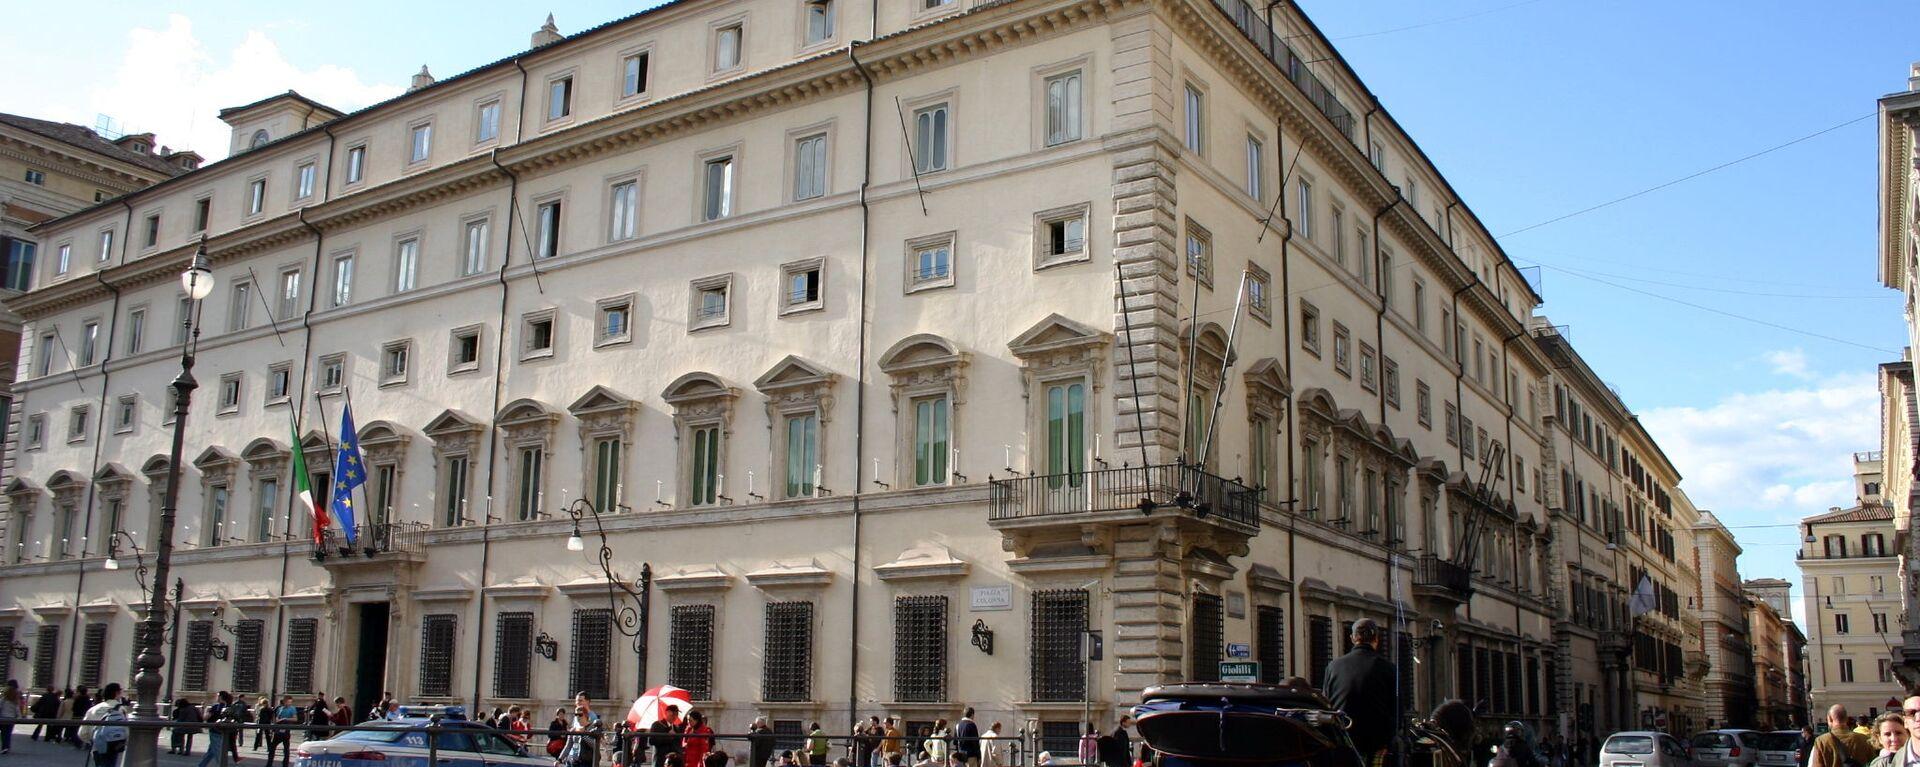 Il Palazzo Chigi - Sputnik Italia, 1920, 16.04.2021